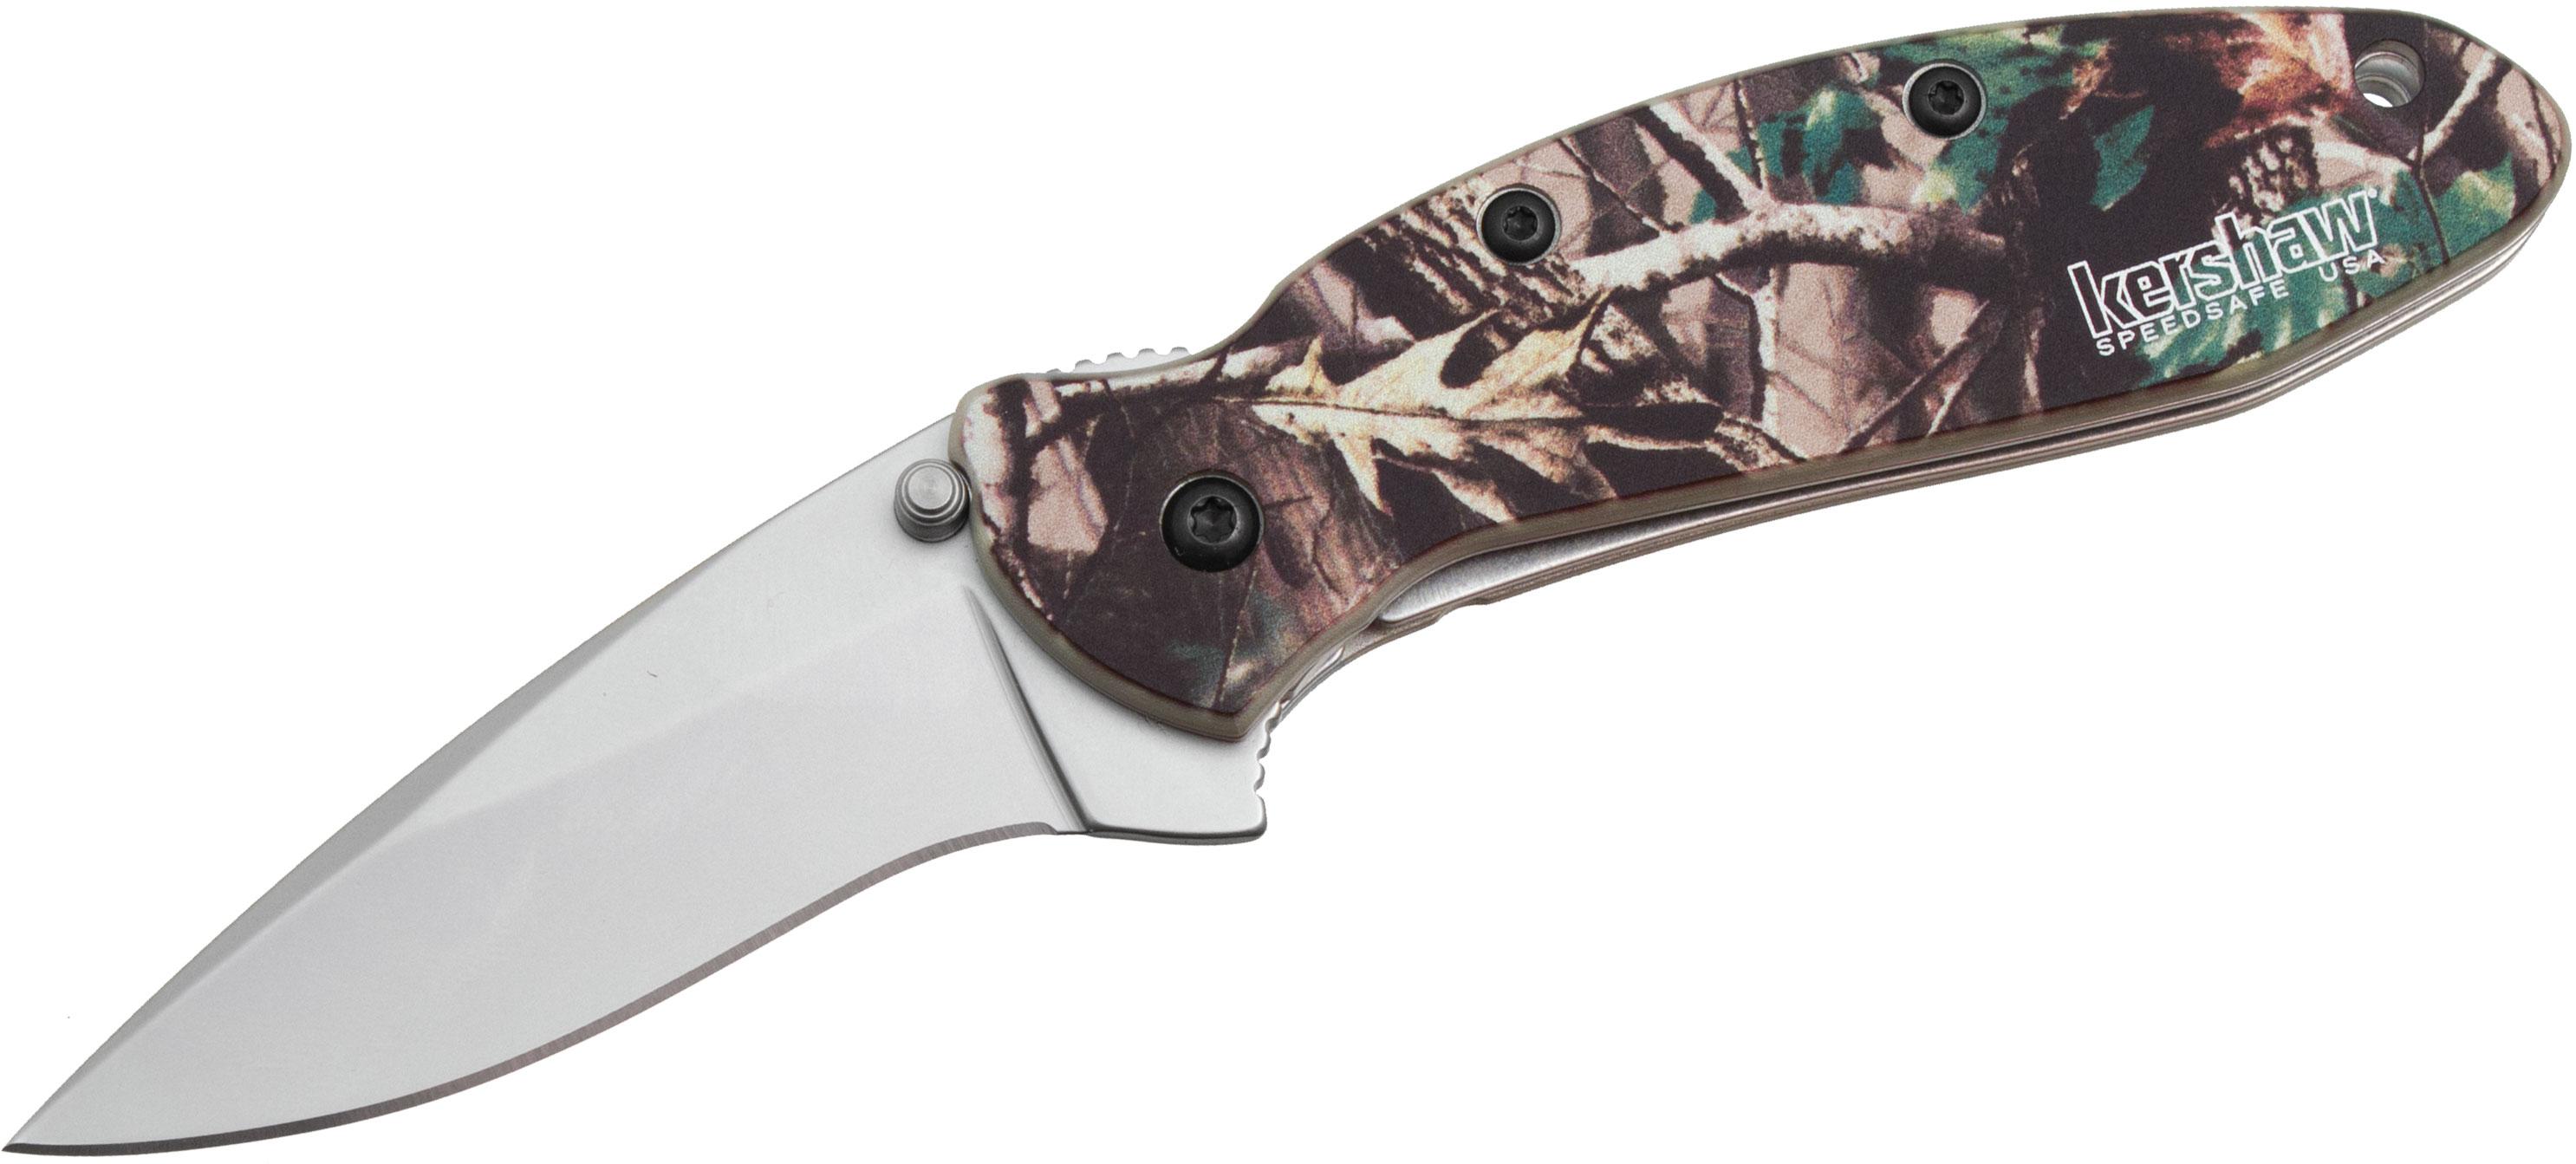 Kershaw 1620C Ken Onion Scallion Assisted Flipper Knife 2.25 inch Bead Blast Plain Blade, Realtree Hardwood HD Camo Aluminum Handles